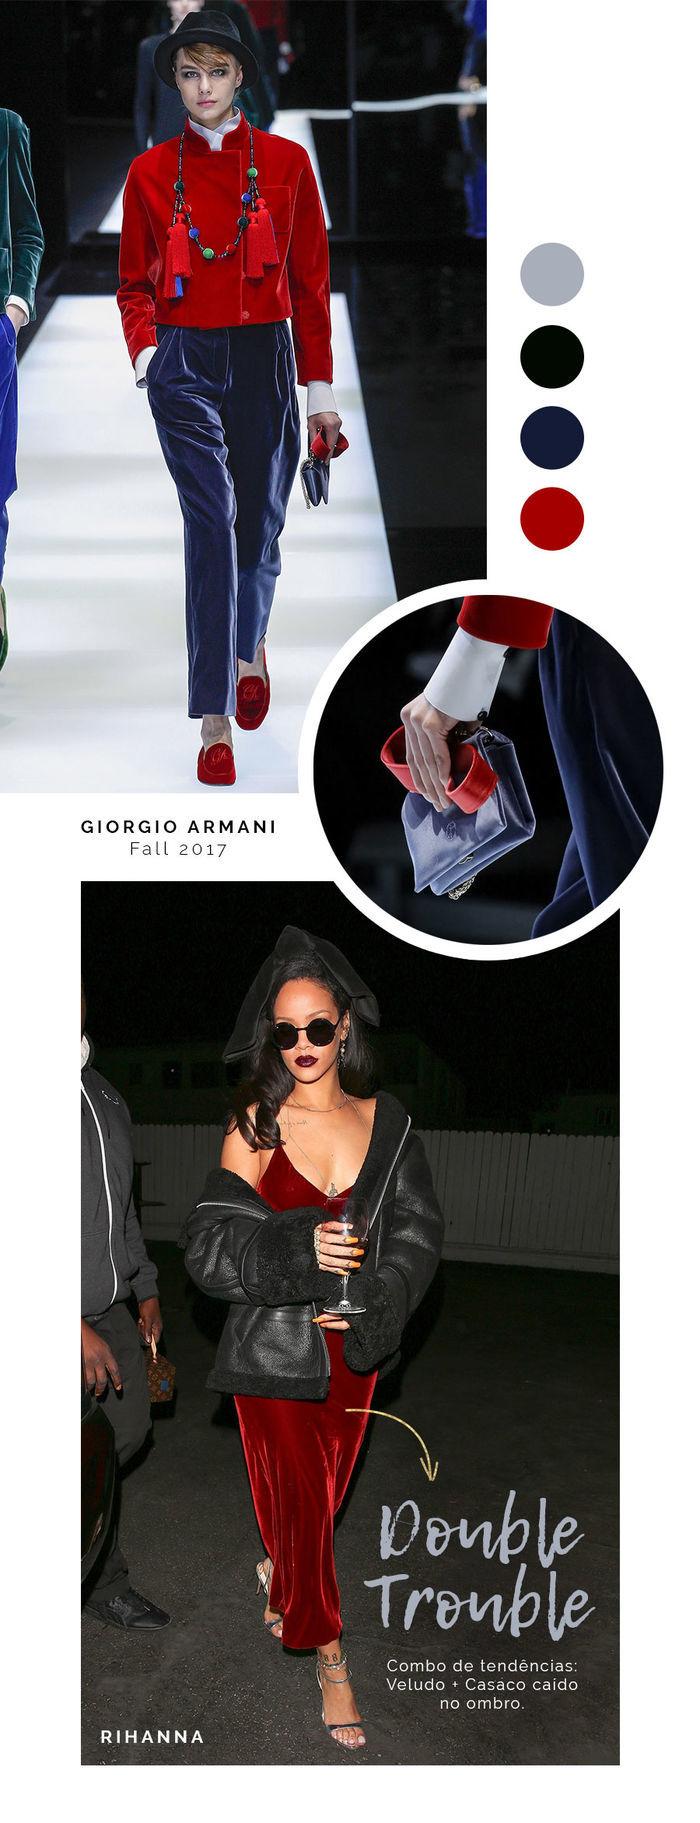 Layla Monteiro Look Inverno Veludo Tendencia Rihanna Armani Bag 2017